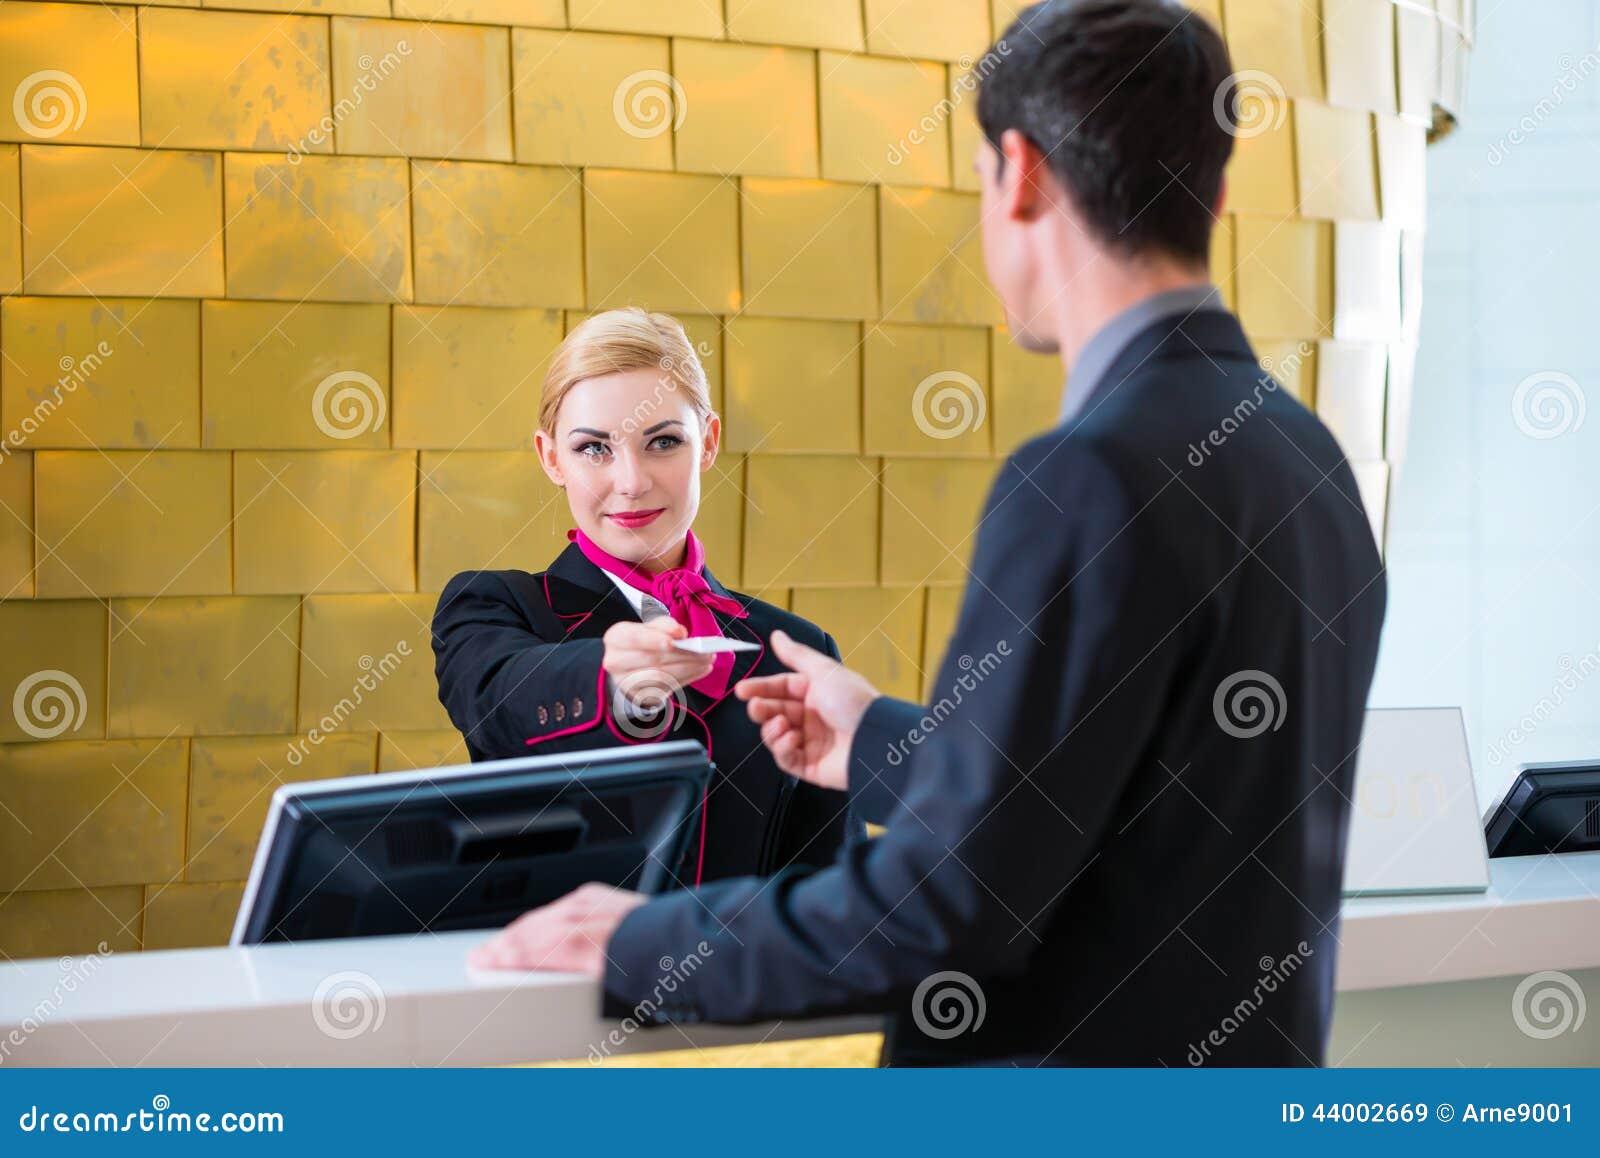 hotel receptionist check in man giving key card stock photo hotel receptionist check in man giving key card